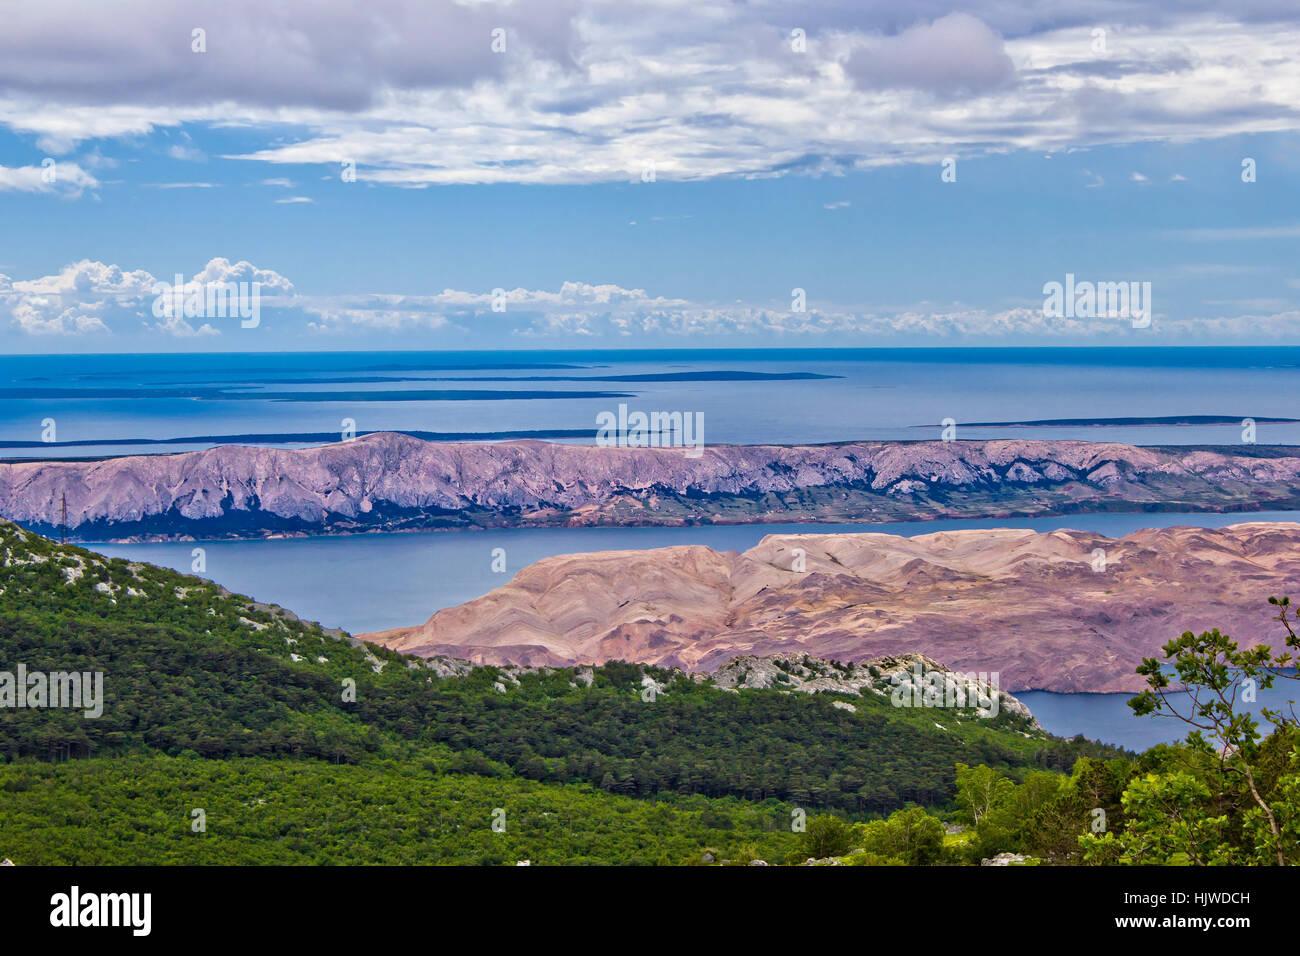 Croatian islands (Pag, Vir, Maun, Olib, Silba, Premuda, Ist, Molat) aerial view from Velebit mountain - Stock Image